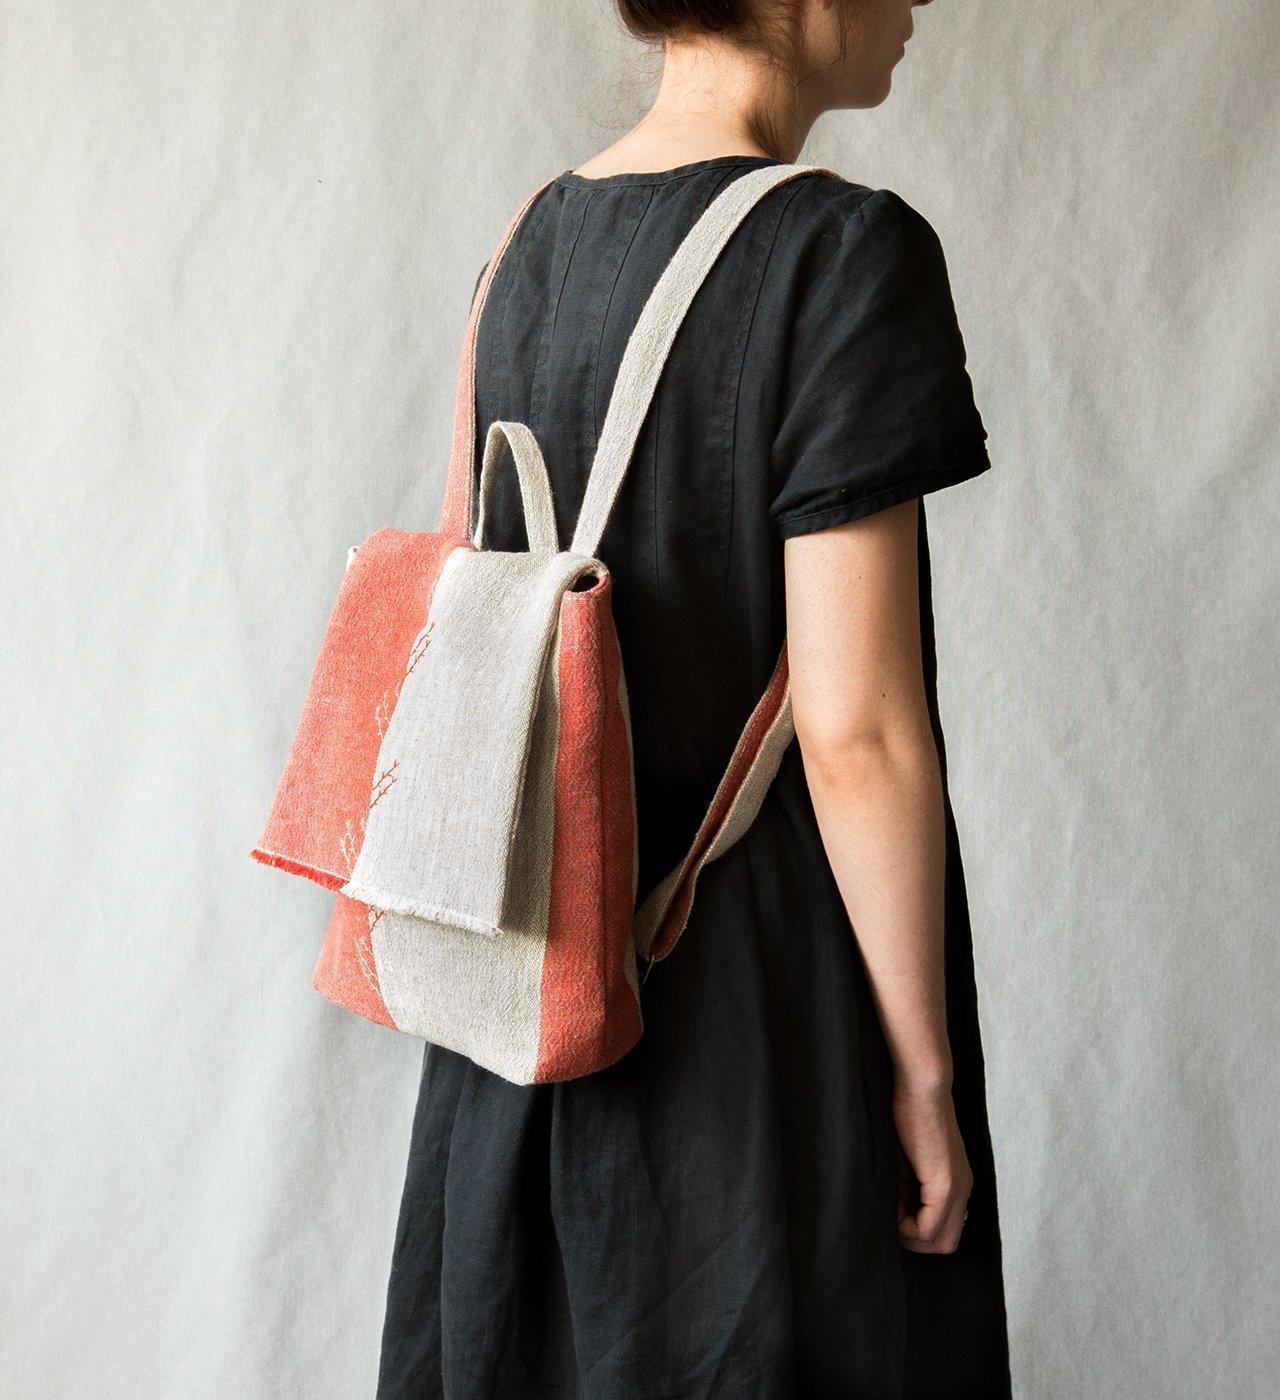 Linen Backpack linen bag textile small backpack summer bag embroidered bag women's backpack red grey bag organic cotton bag mini backpack